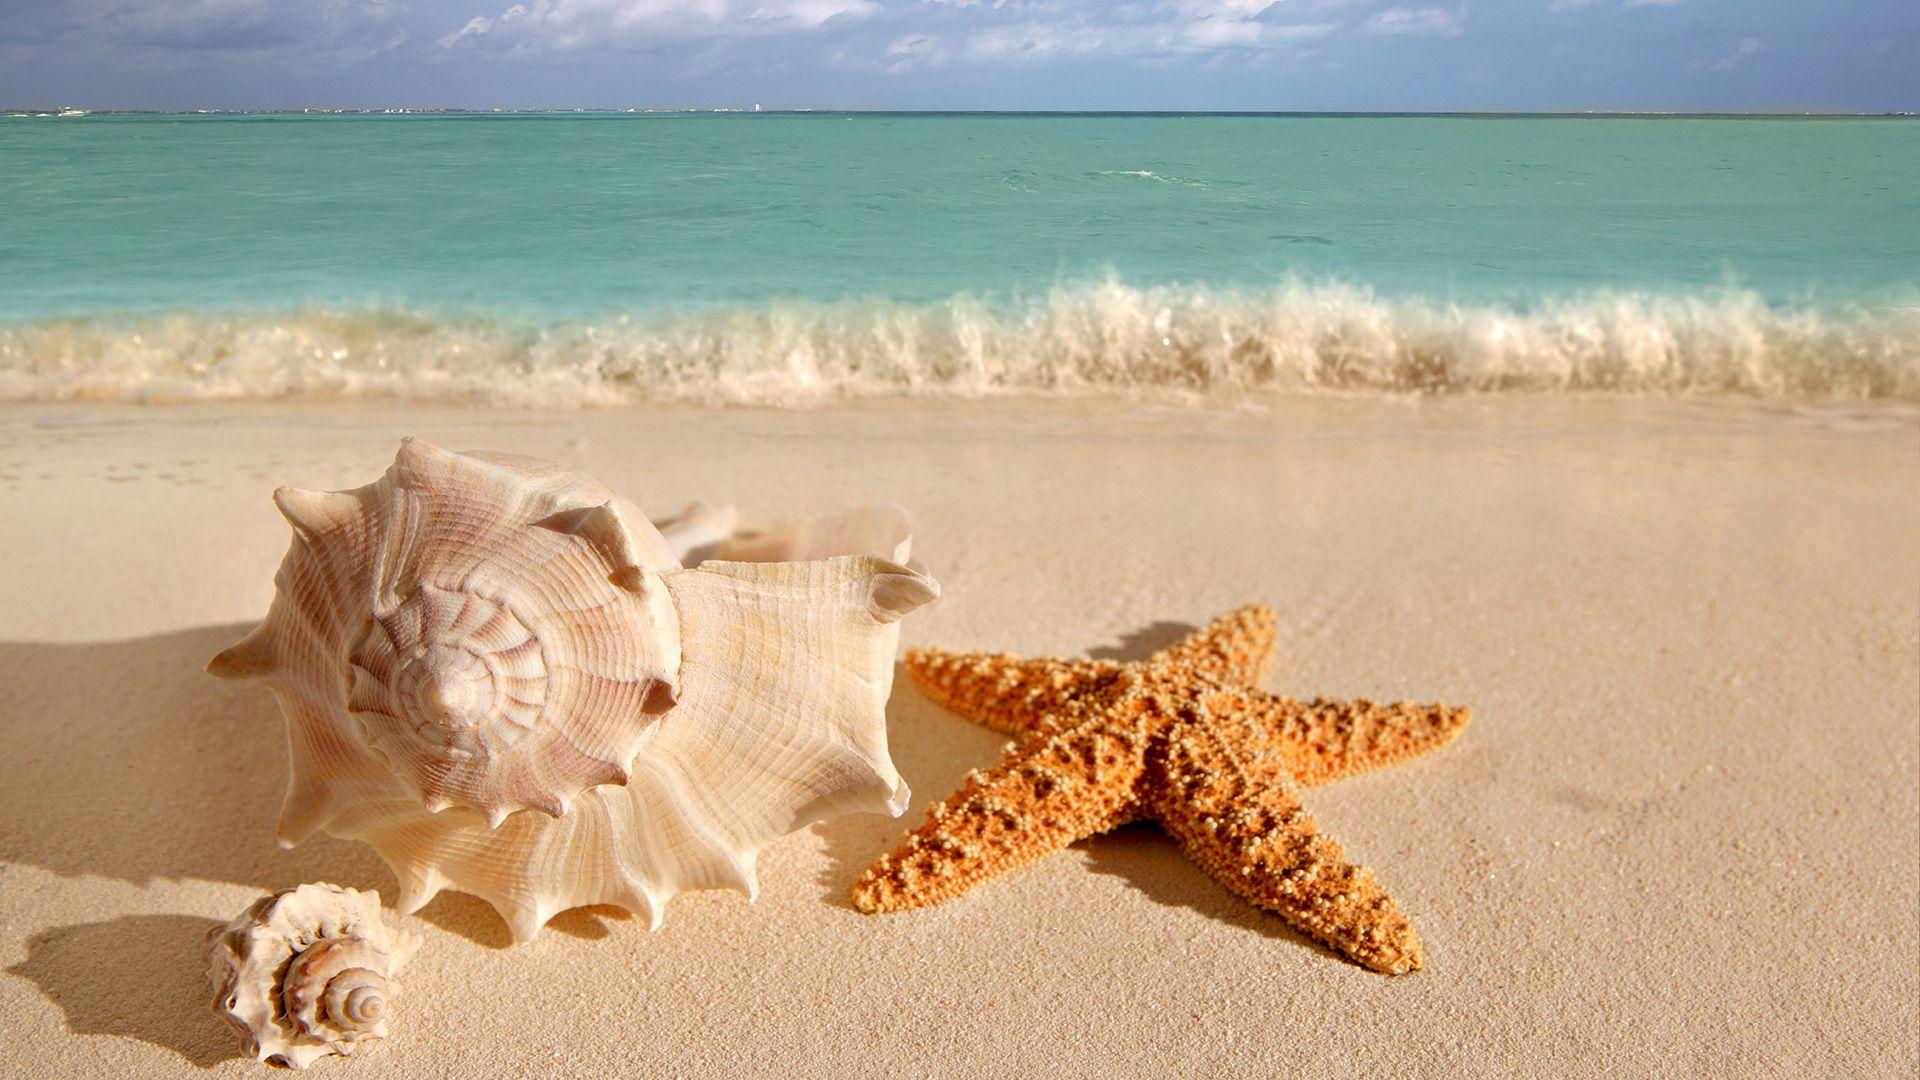 Like Snowflakes No Two Are Alike Conchas Sfondo Spiaggia